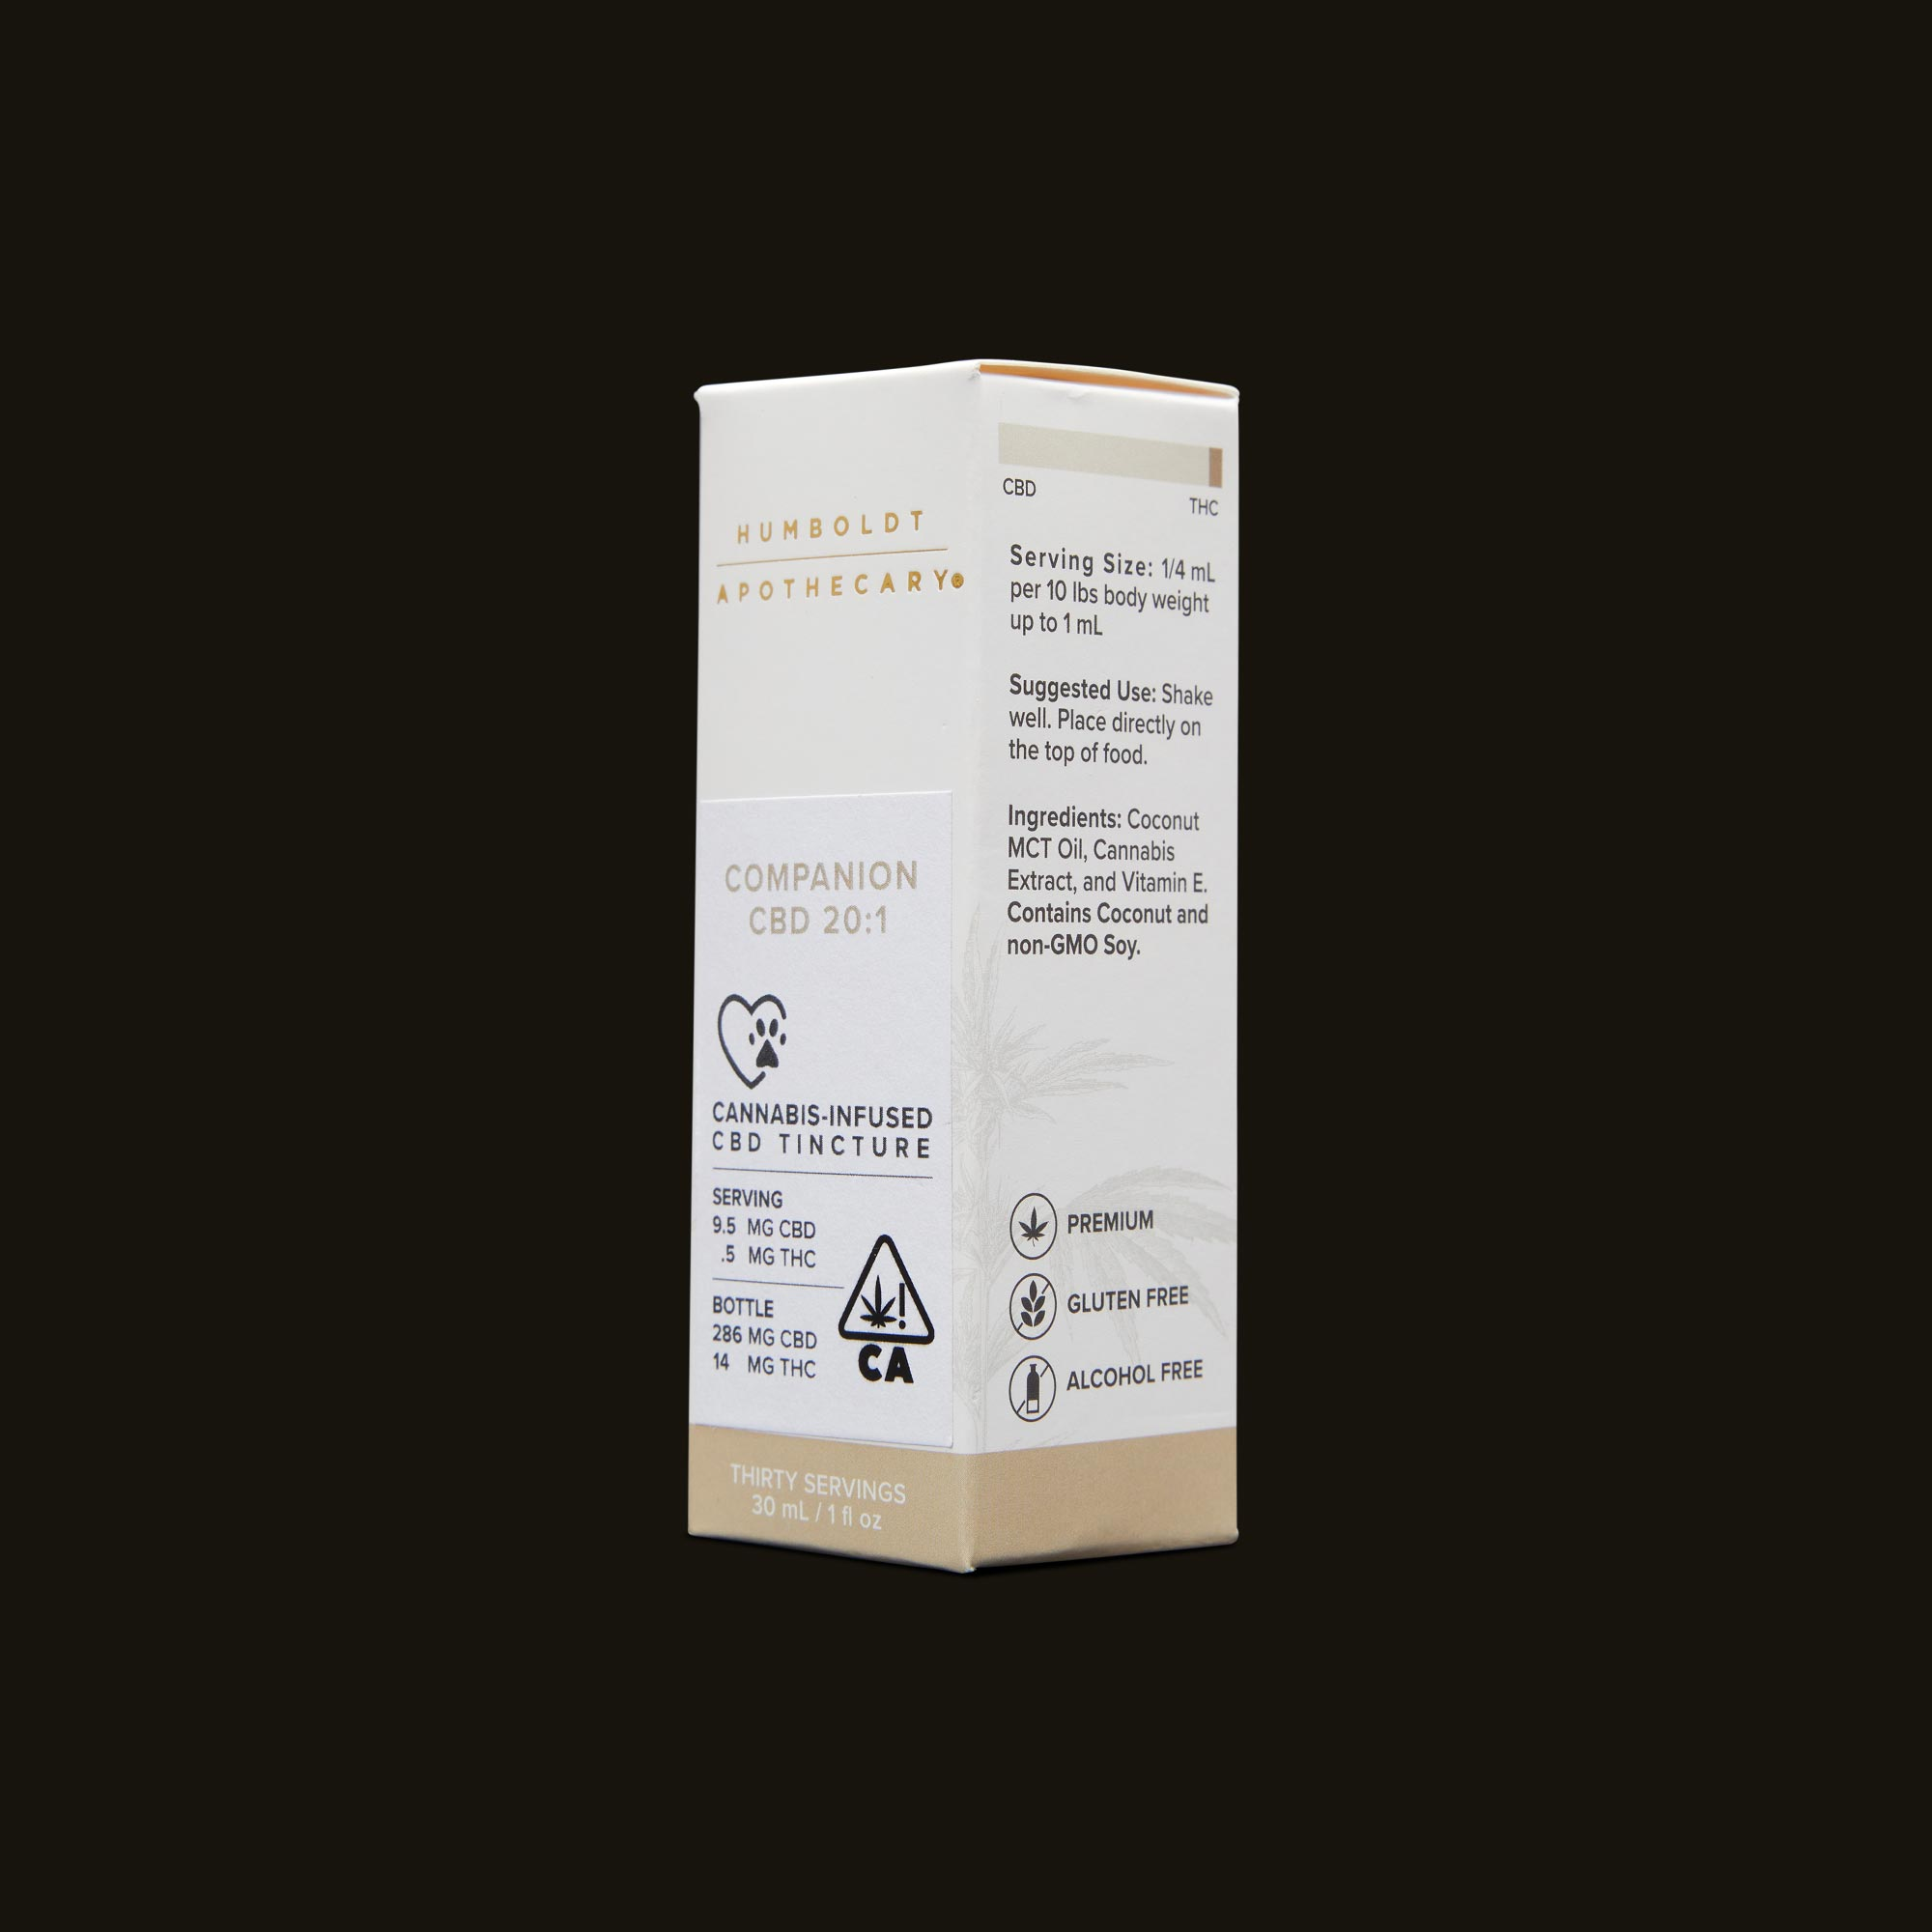 Humboldt Apothecary Pet CBD 20:1 Ingredients